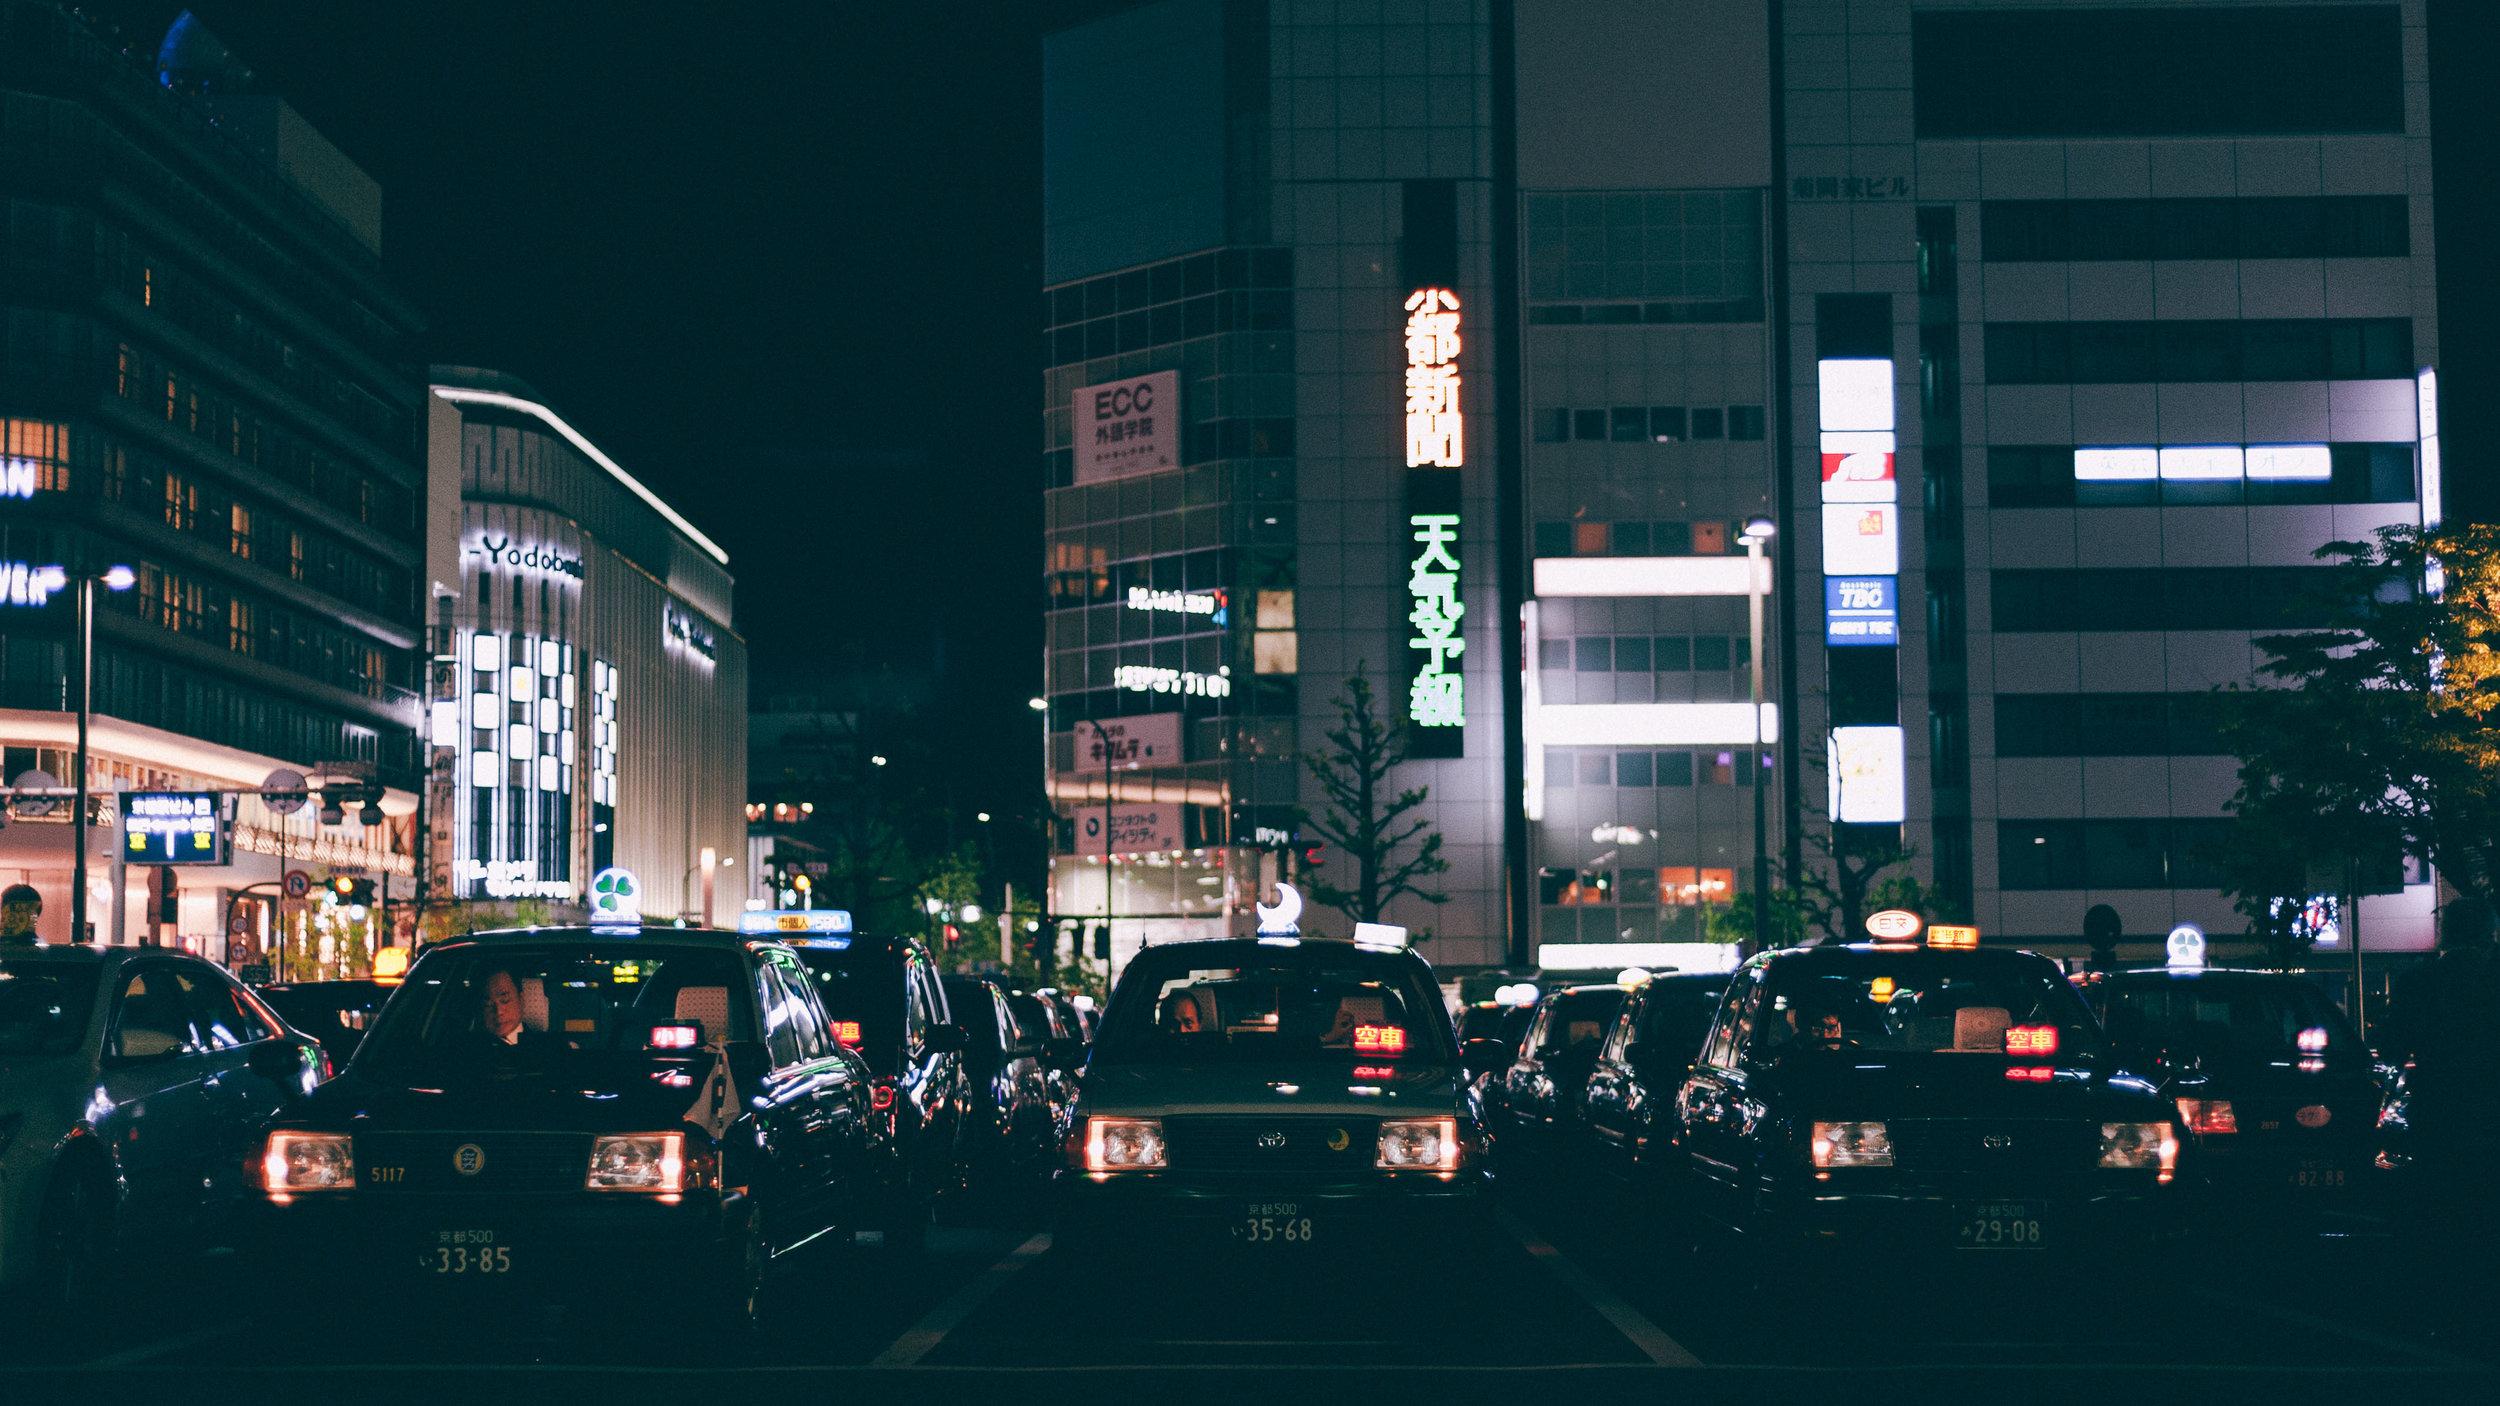 kyoto-taxi-rank-station-night-photography.jpg